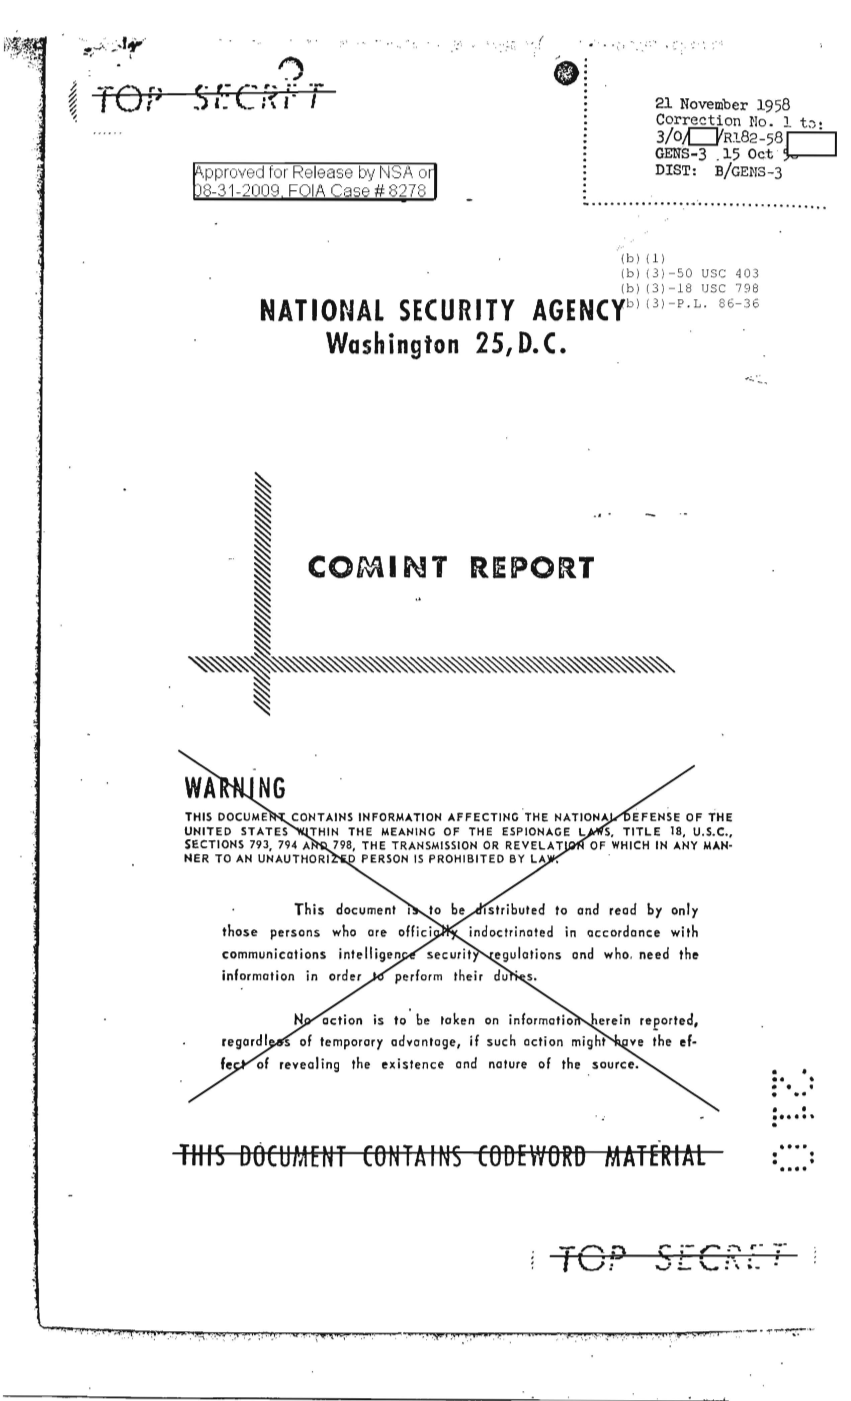 SHOOT_DOWN_C-130_BY_SOVIET_AIRCRAFT.PDF